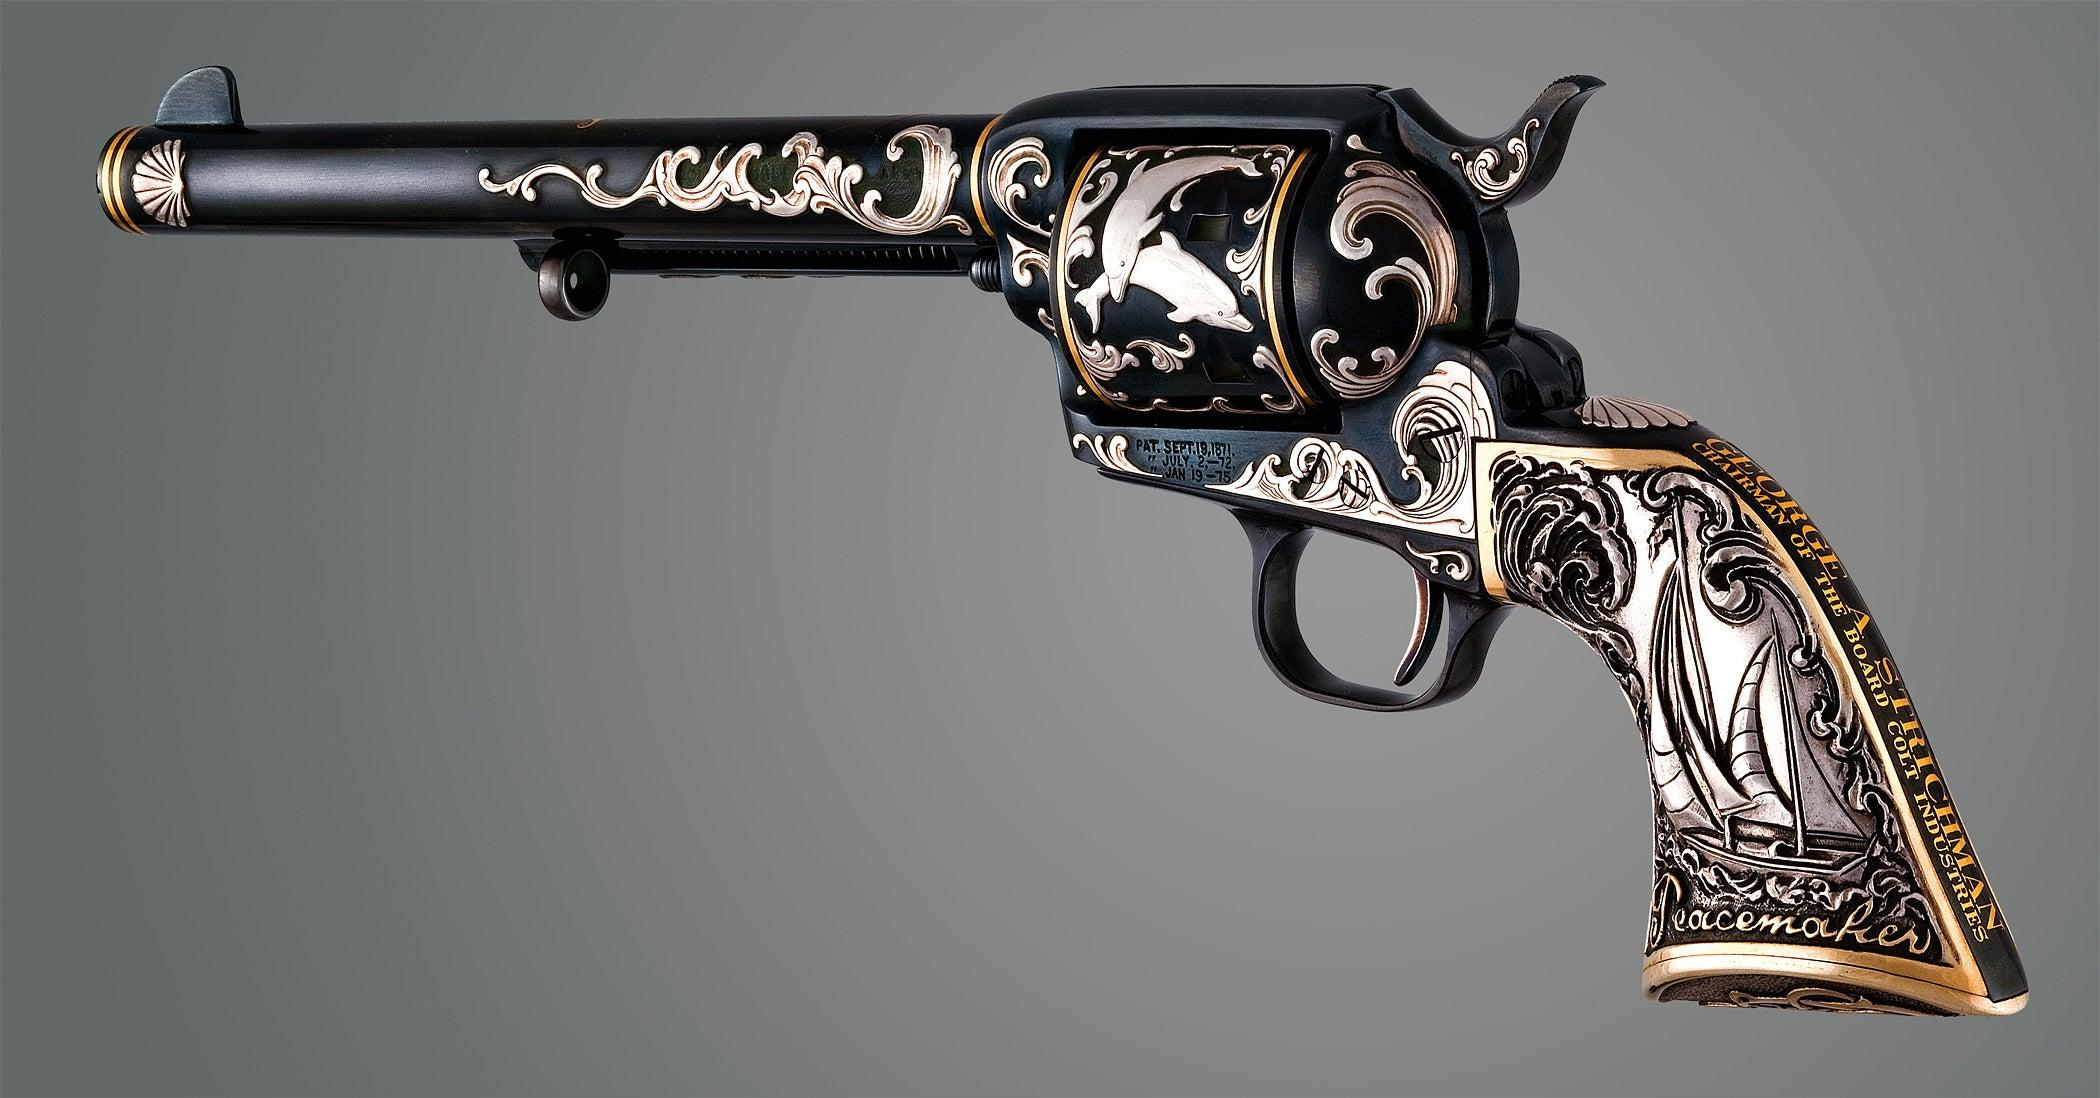 The Elegant Firearms of Tiffany & Co.